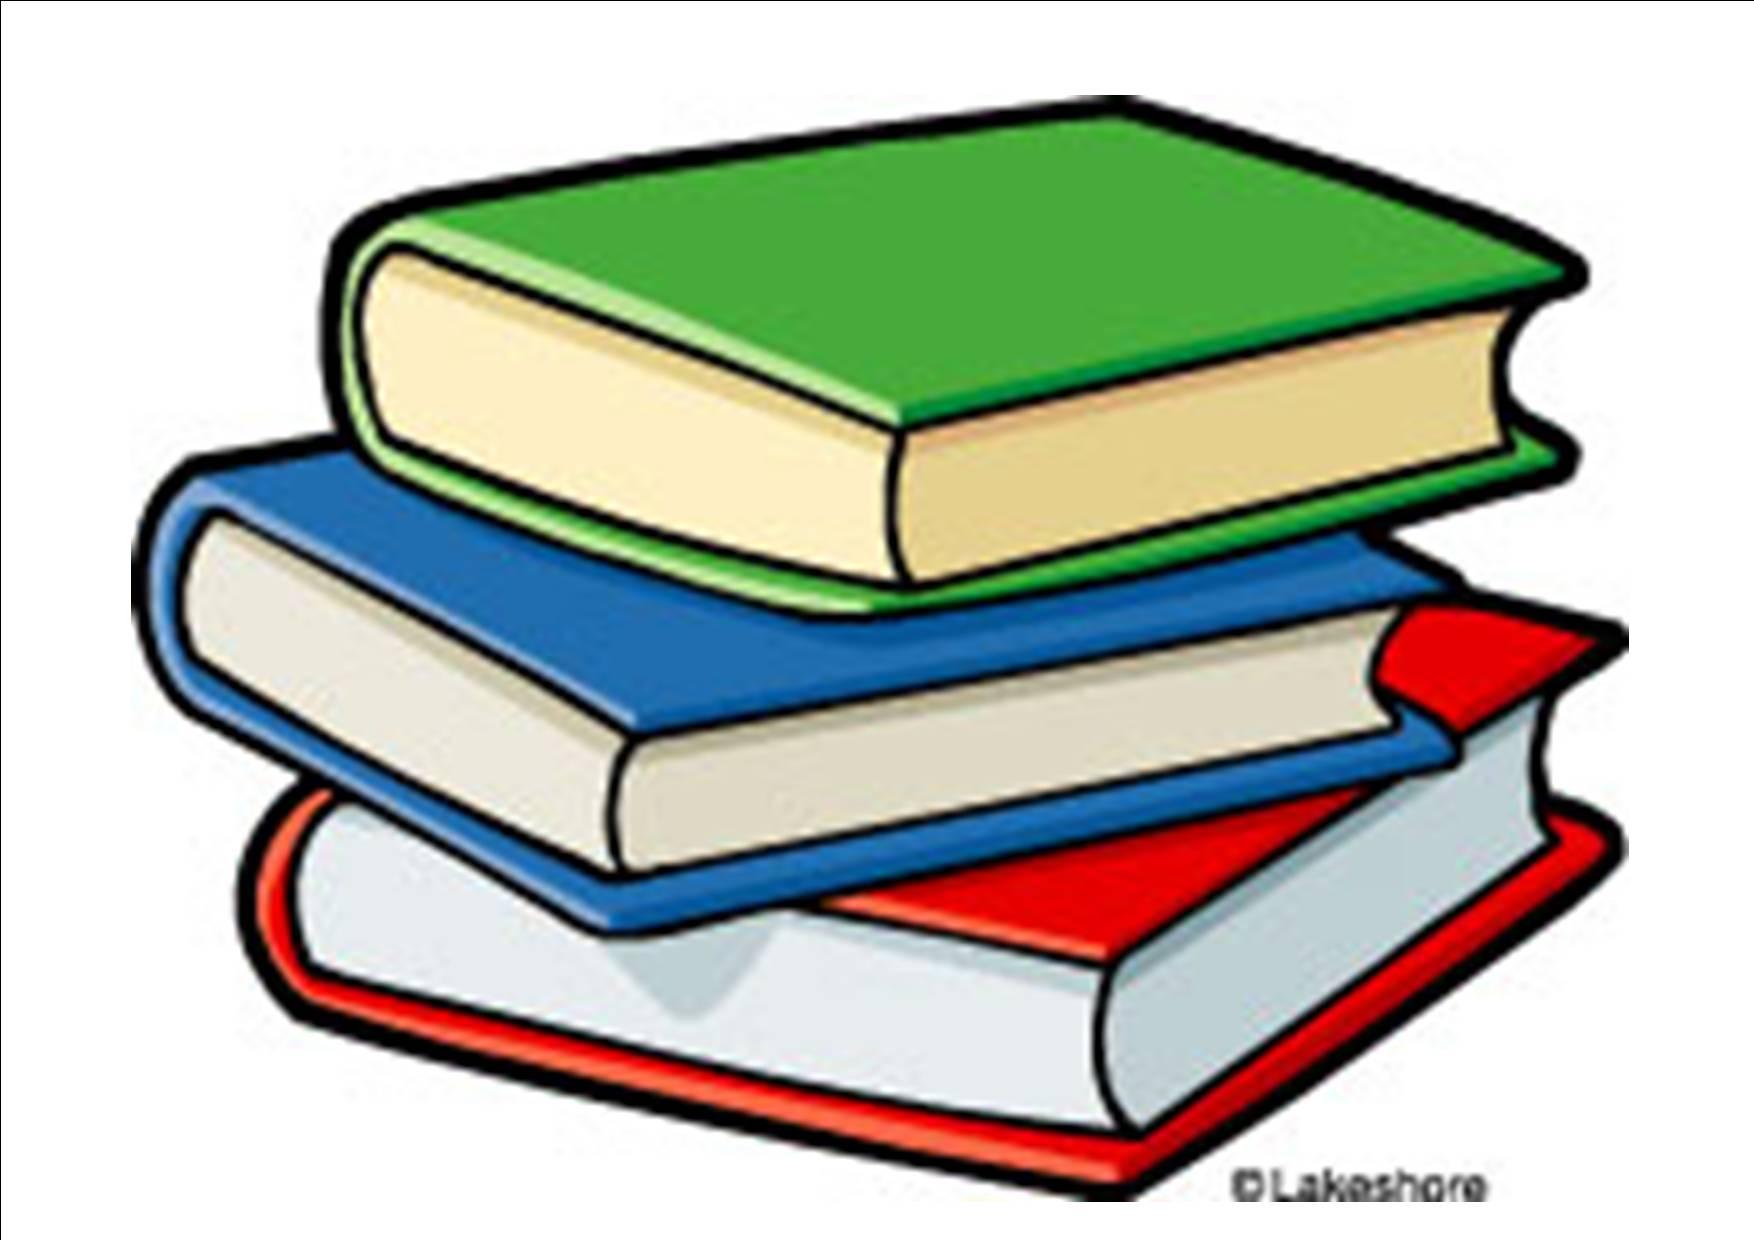 Book Cover Clip Art | Clipart Panda - Free Clipart Images (1754 x 1240 Pixel)